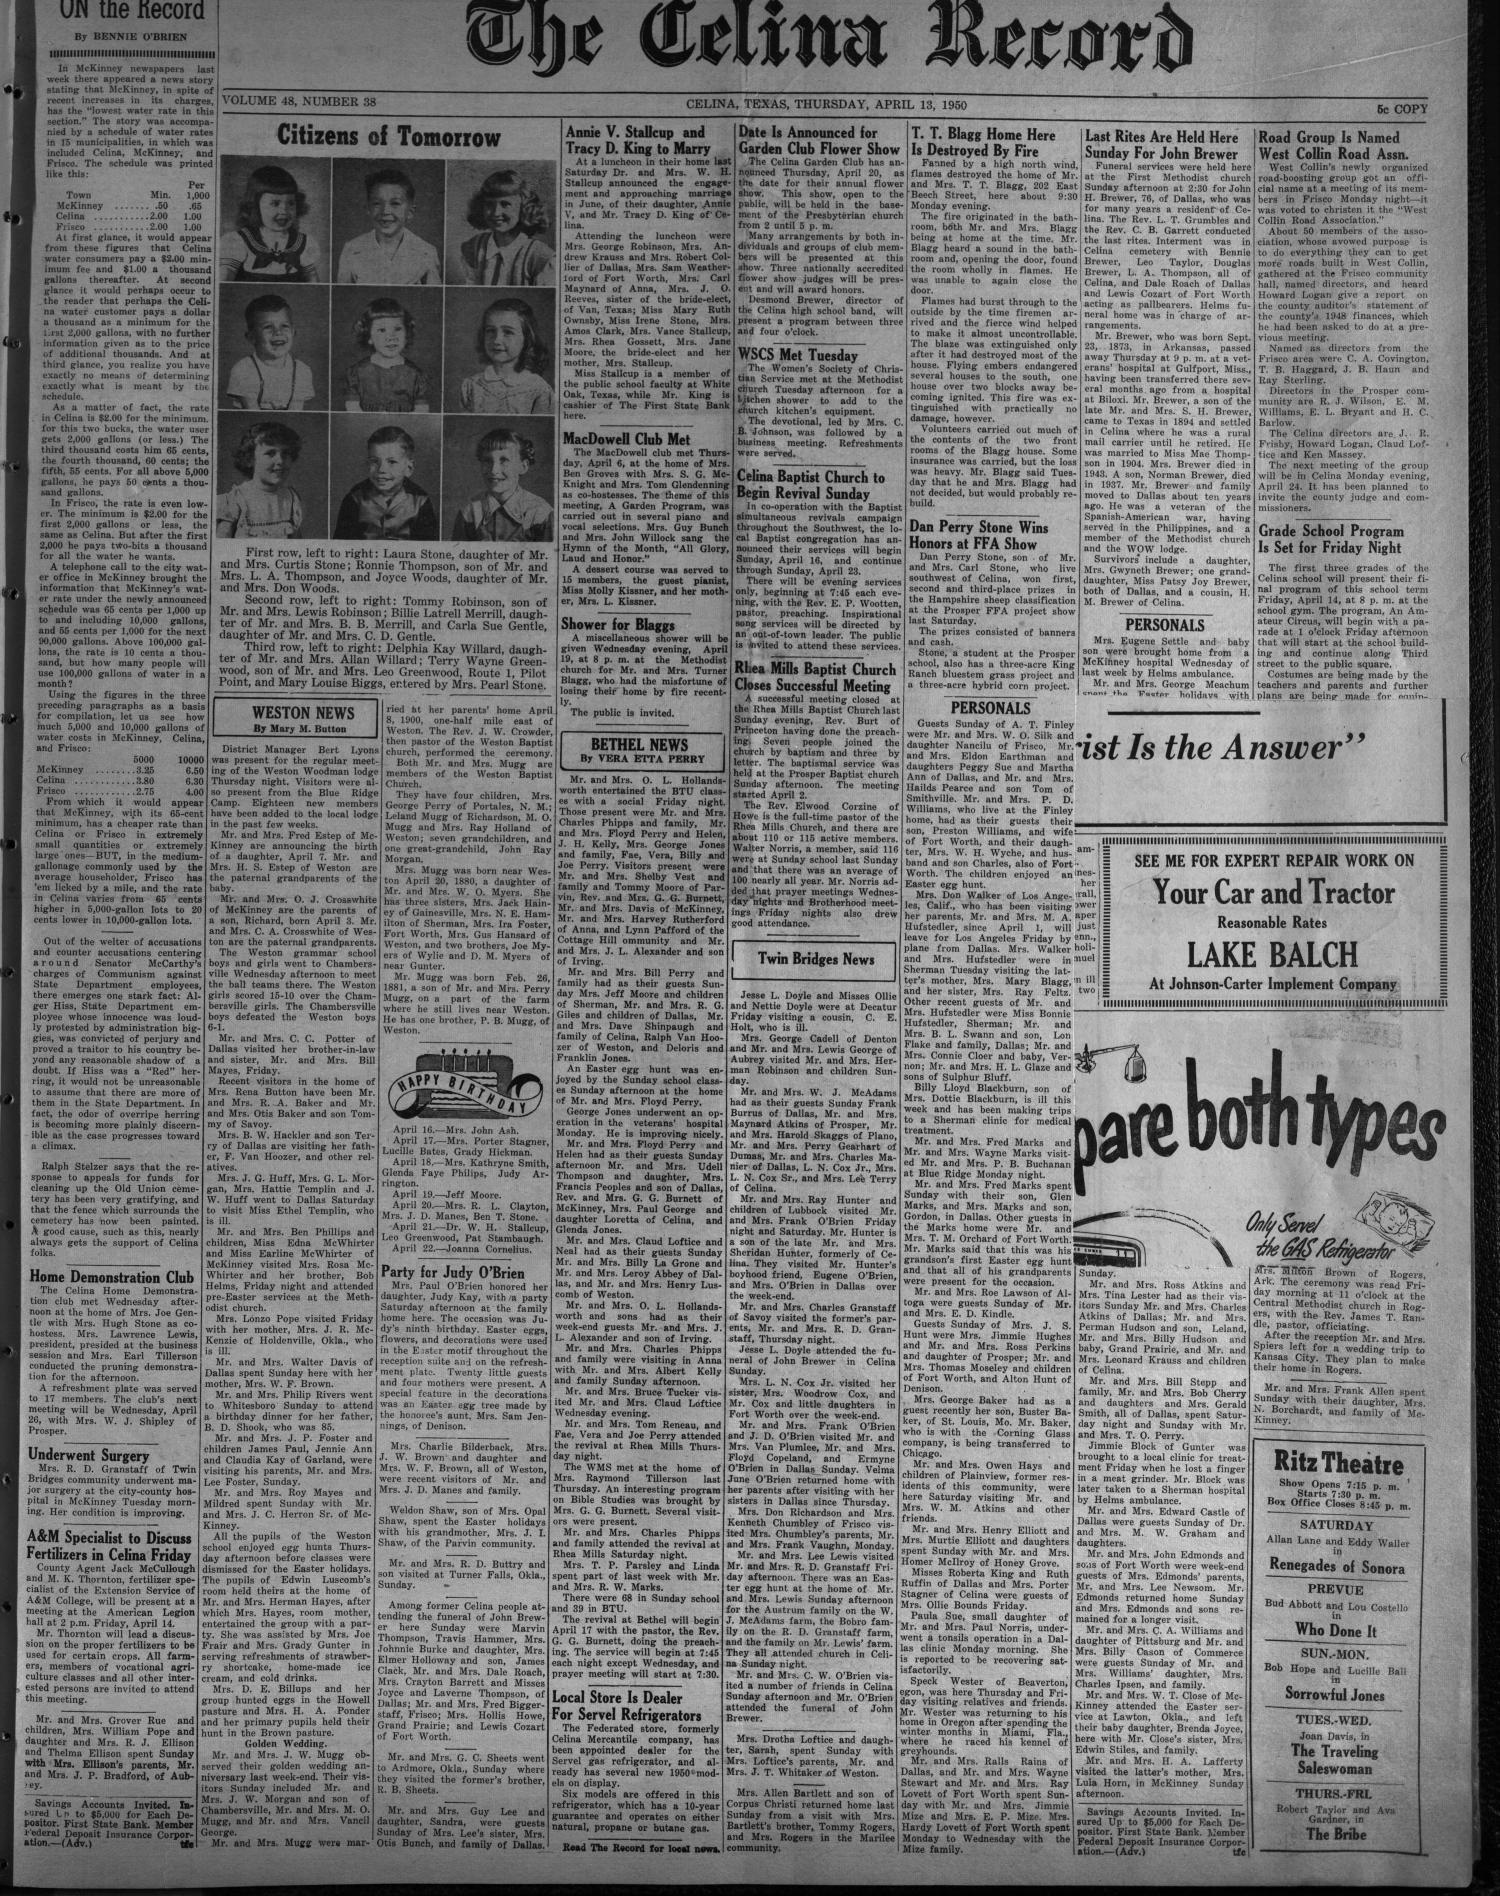 The Celina Record (Celina, Tex.), Vol. 48, No. 38, Ed. 1 Thursday, April 13, 1950 - Page 1 of 4 - The Portal to Texas History